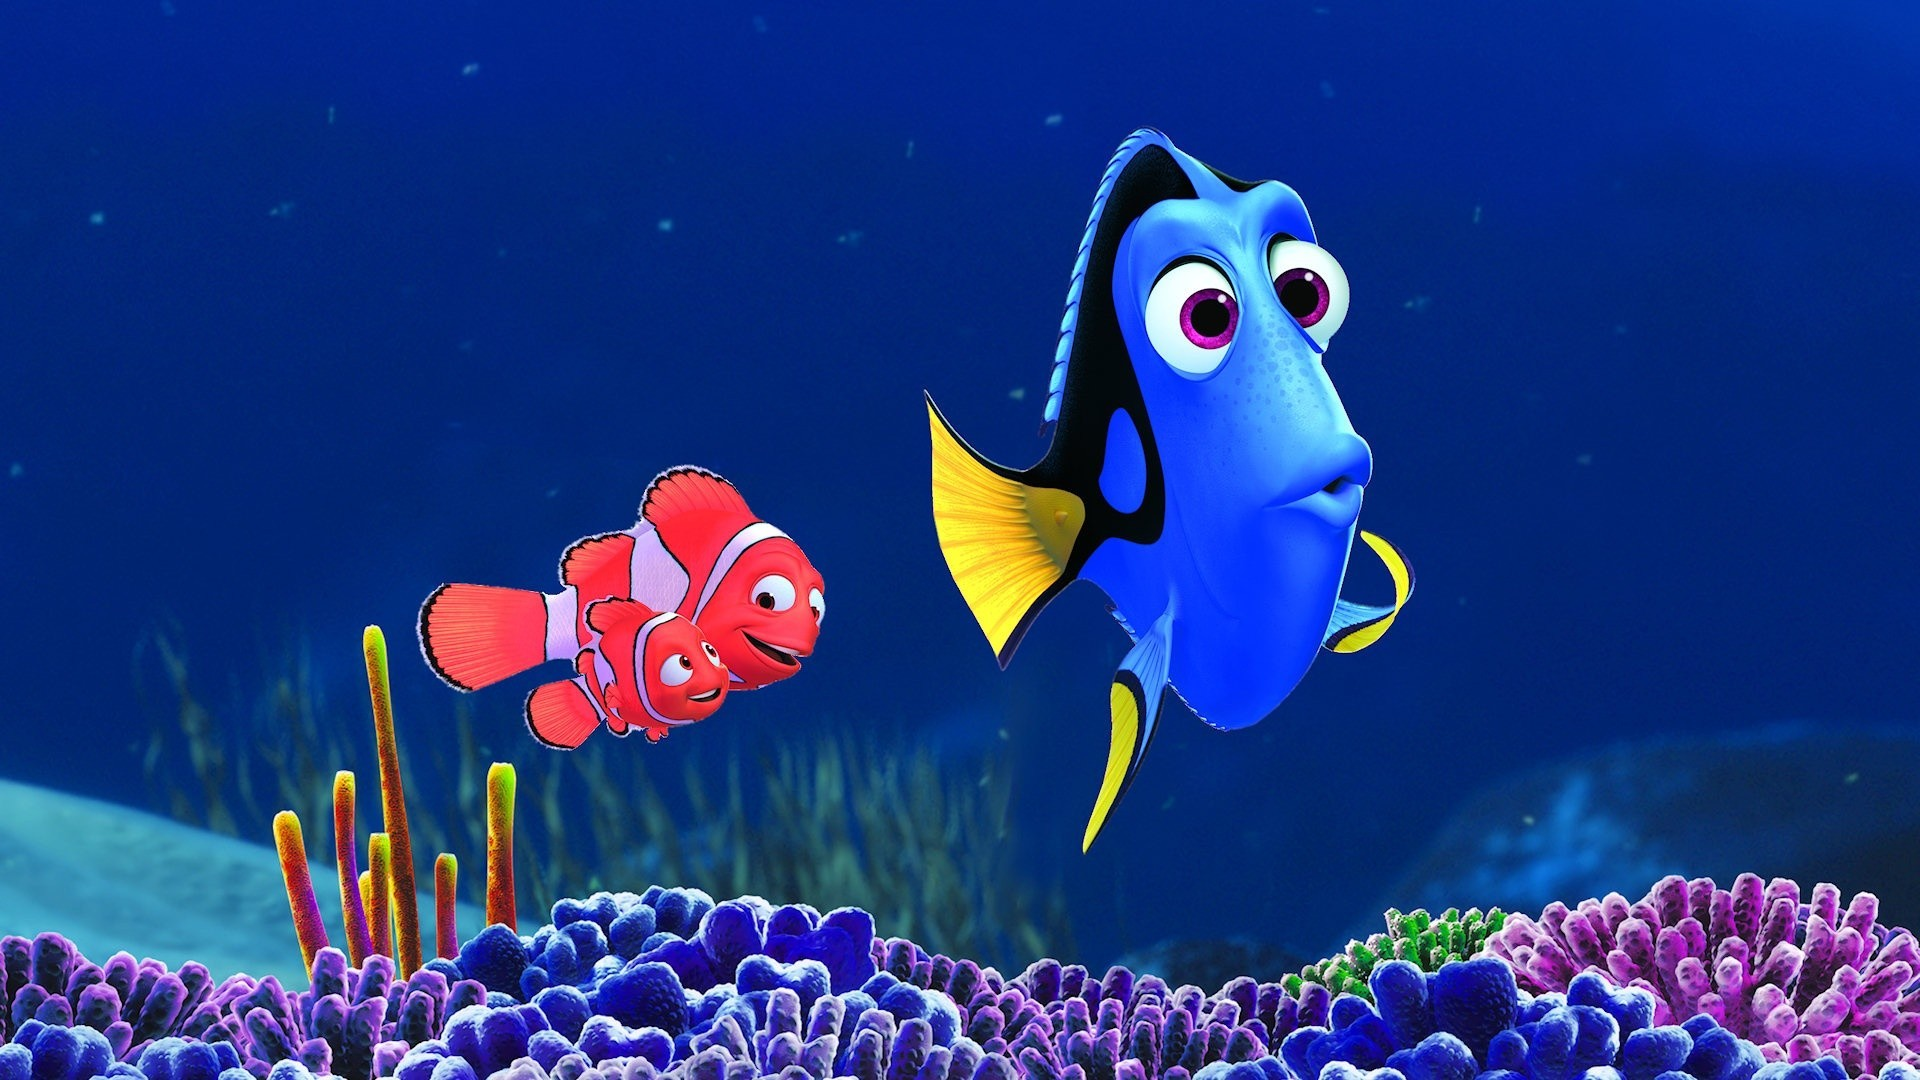 Disney Movie Backgrounds | Desktop Image